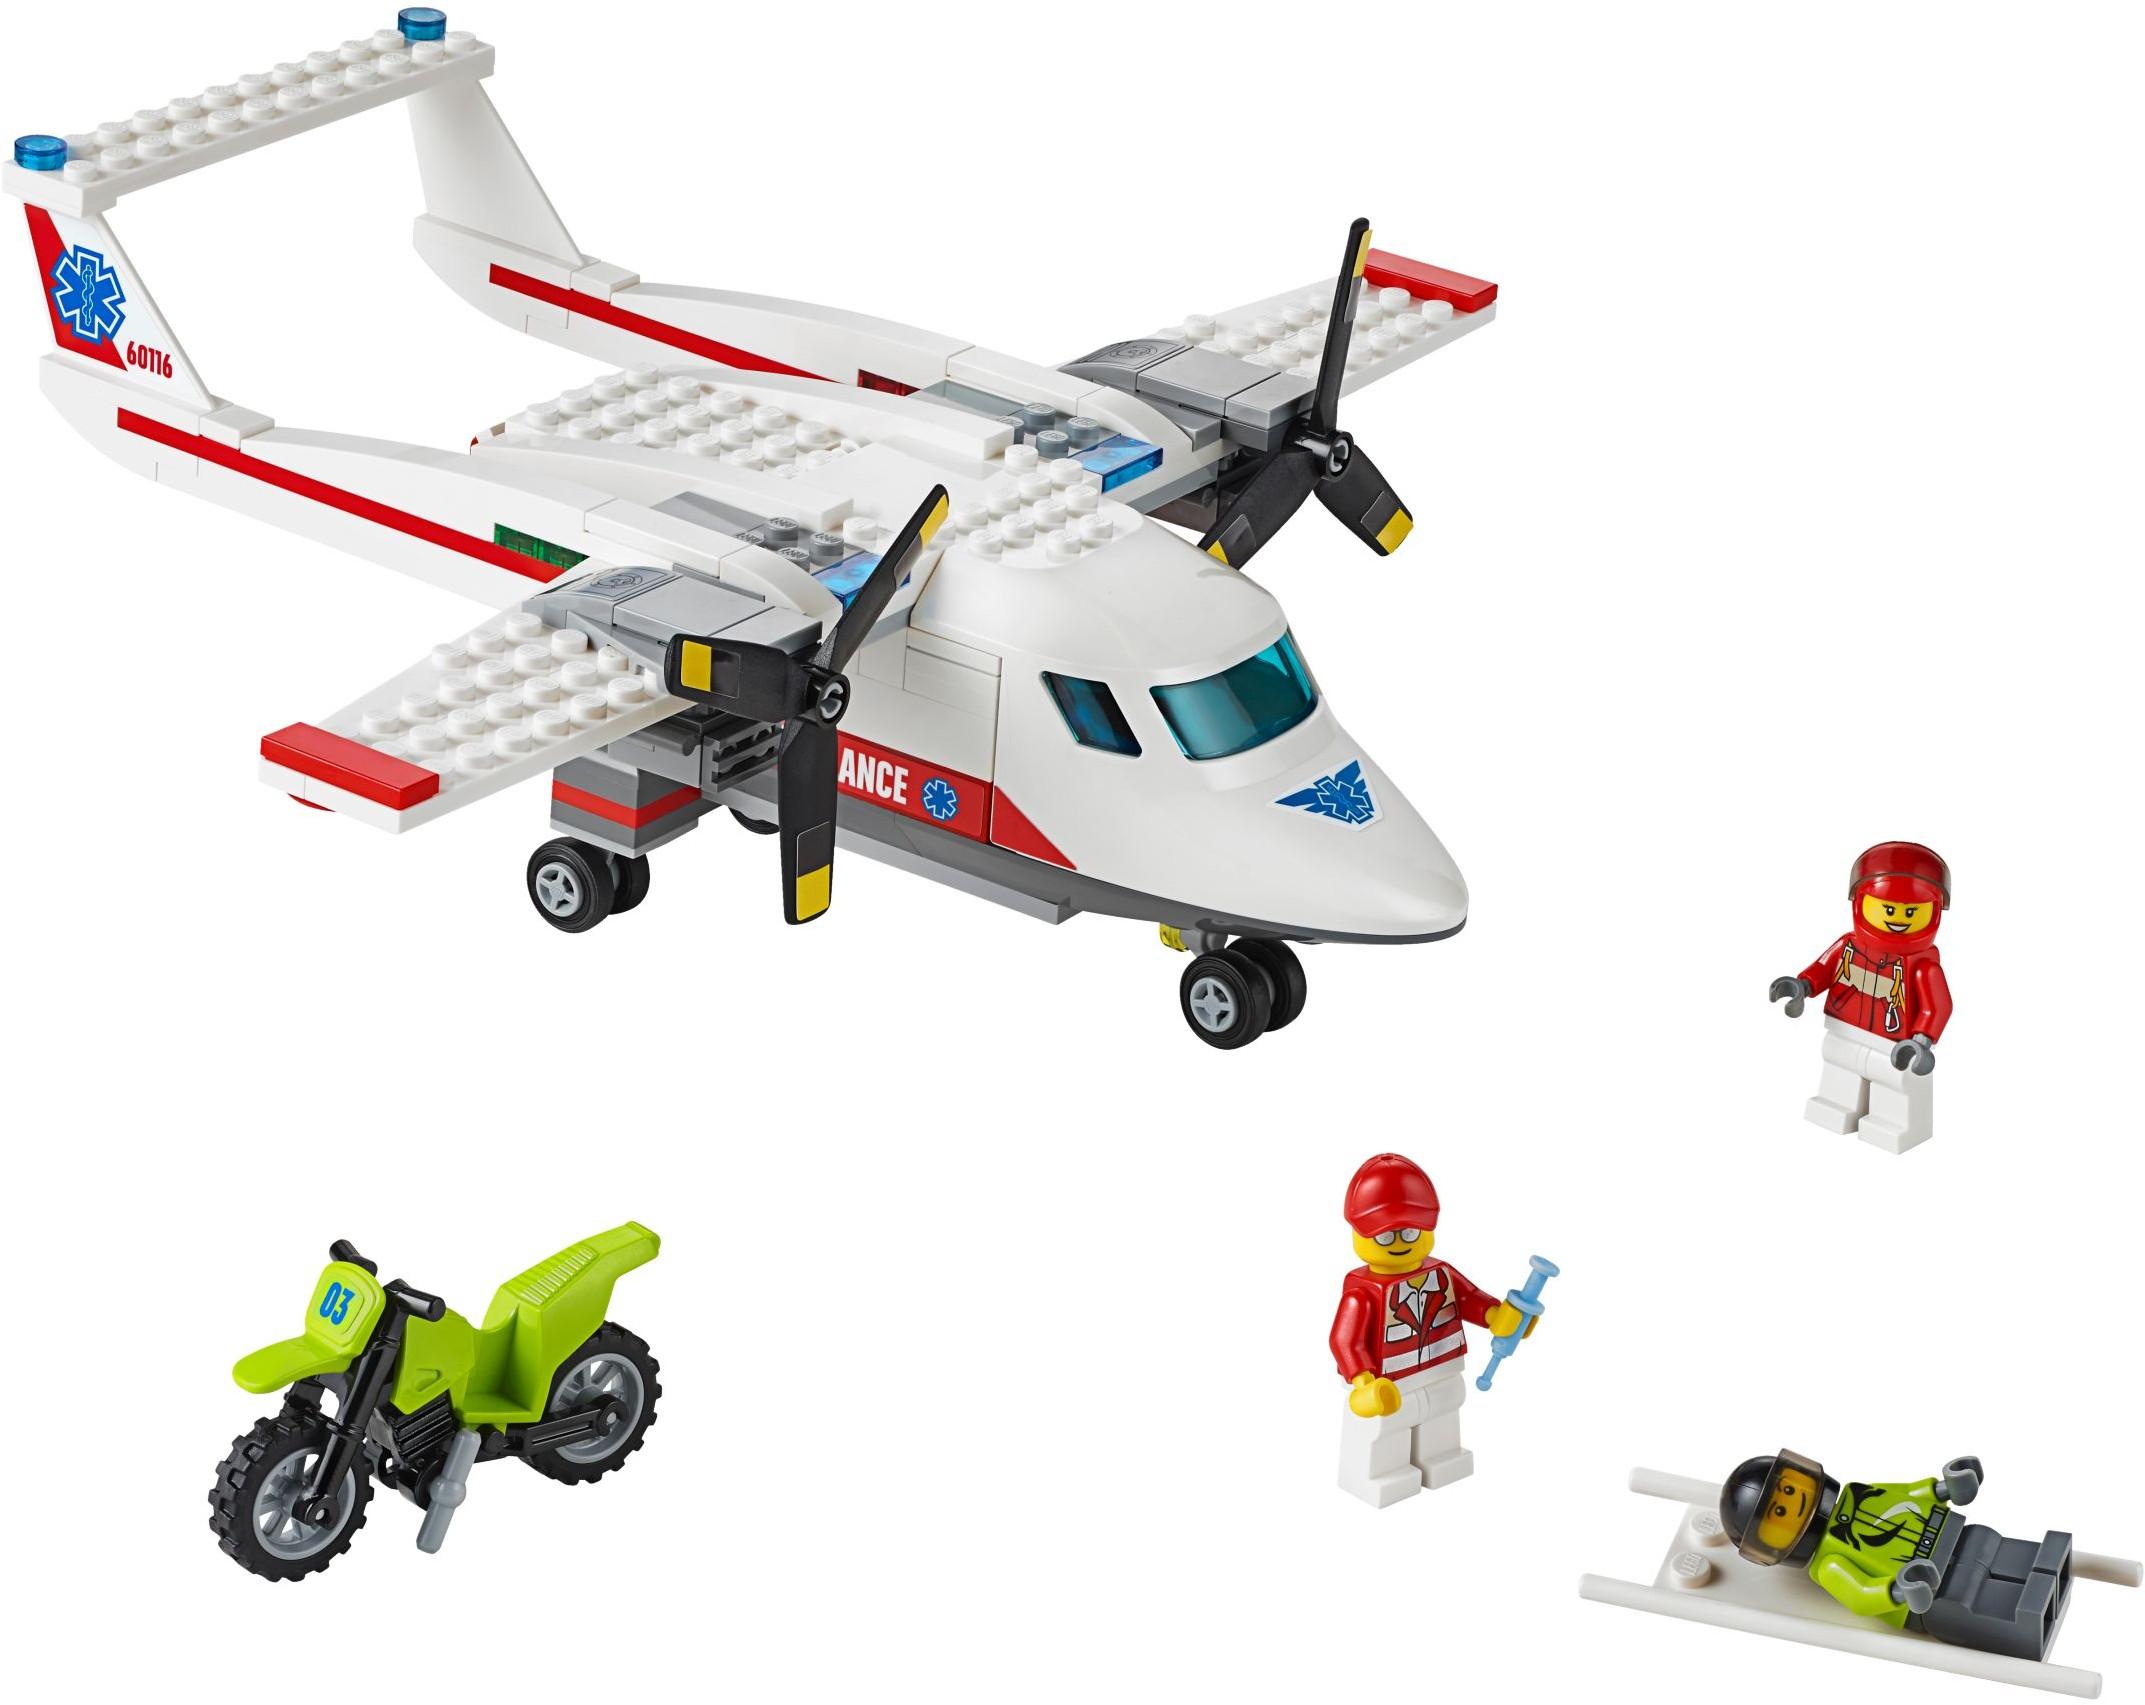 City Tagged Propeller Aircraft Brickset Lego Set Guide And